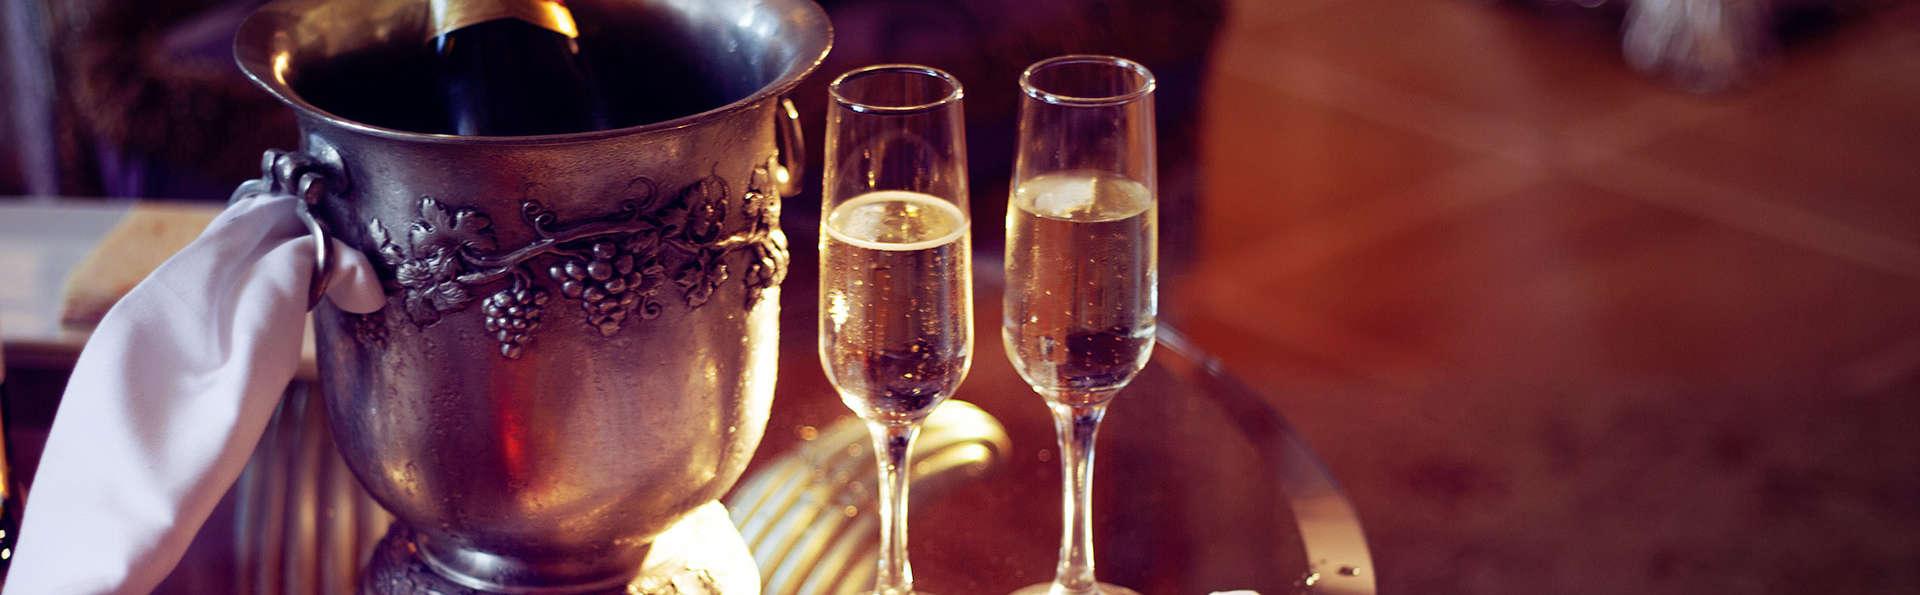 charmeweekend saint priest met fles champagne vanaf 79. Black Bedroom Furniture Sets. Home Design Ideas